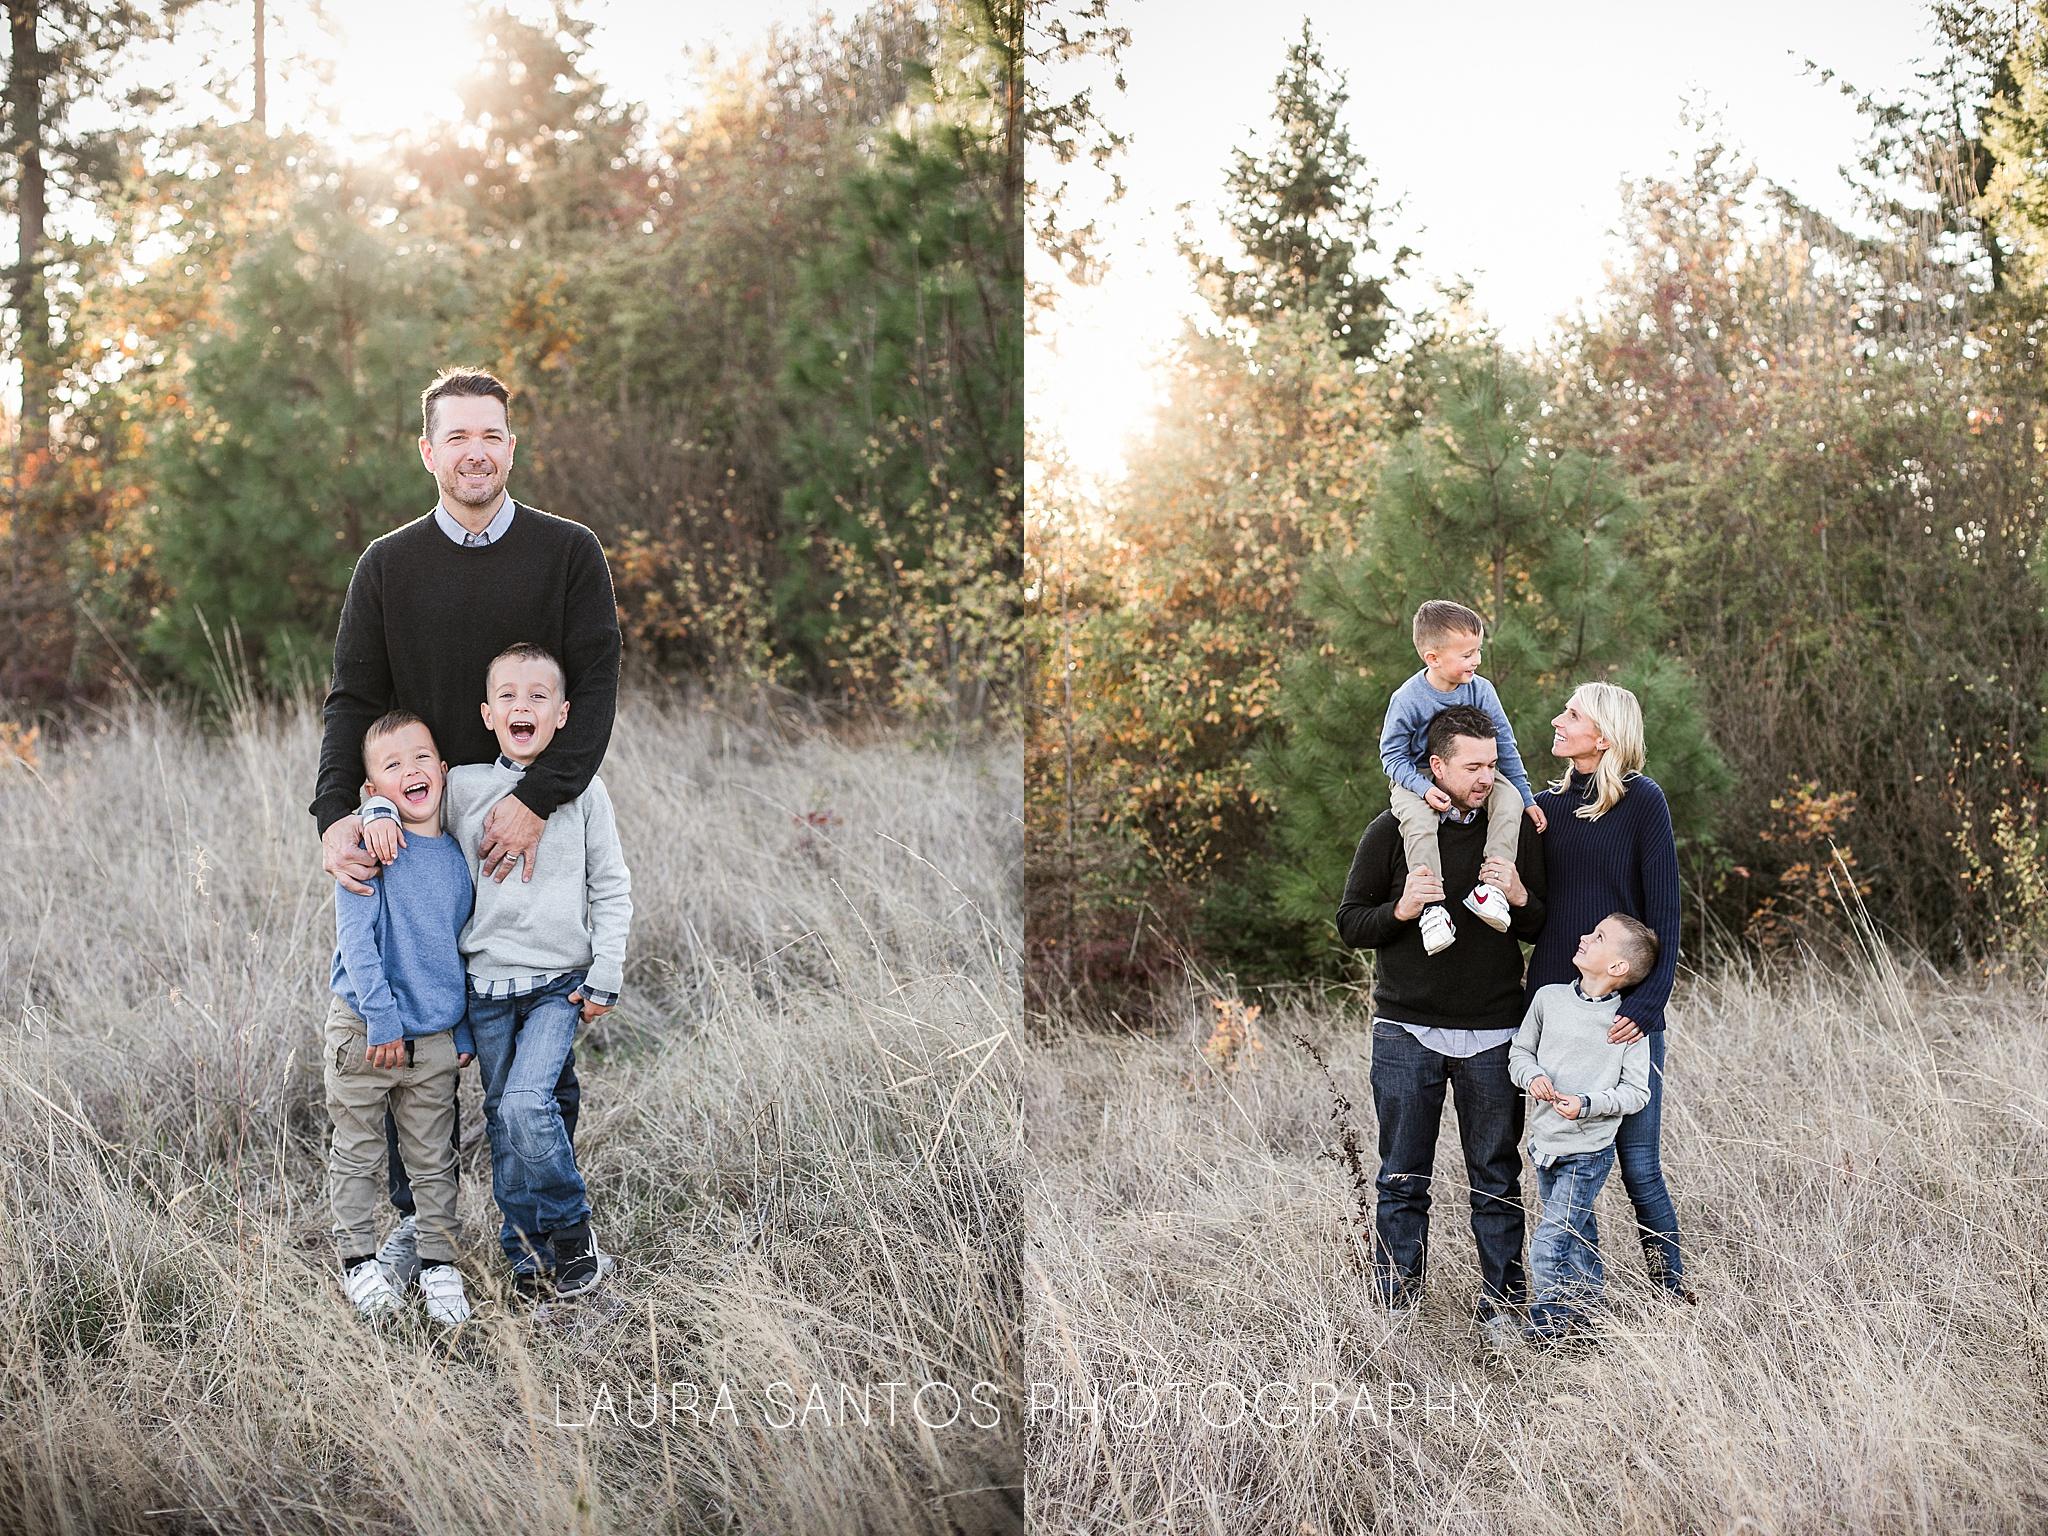 Laura Santos Photography Portland Oregon Family Photographer_0814.jpg